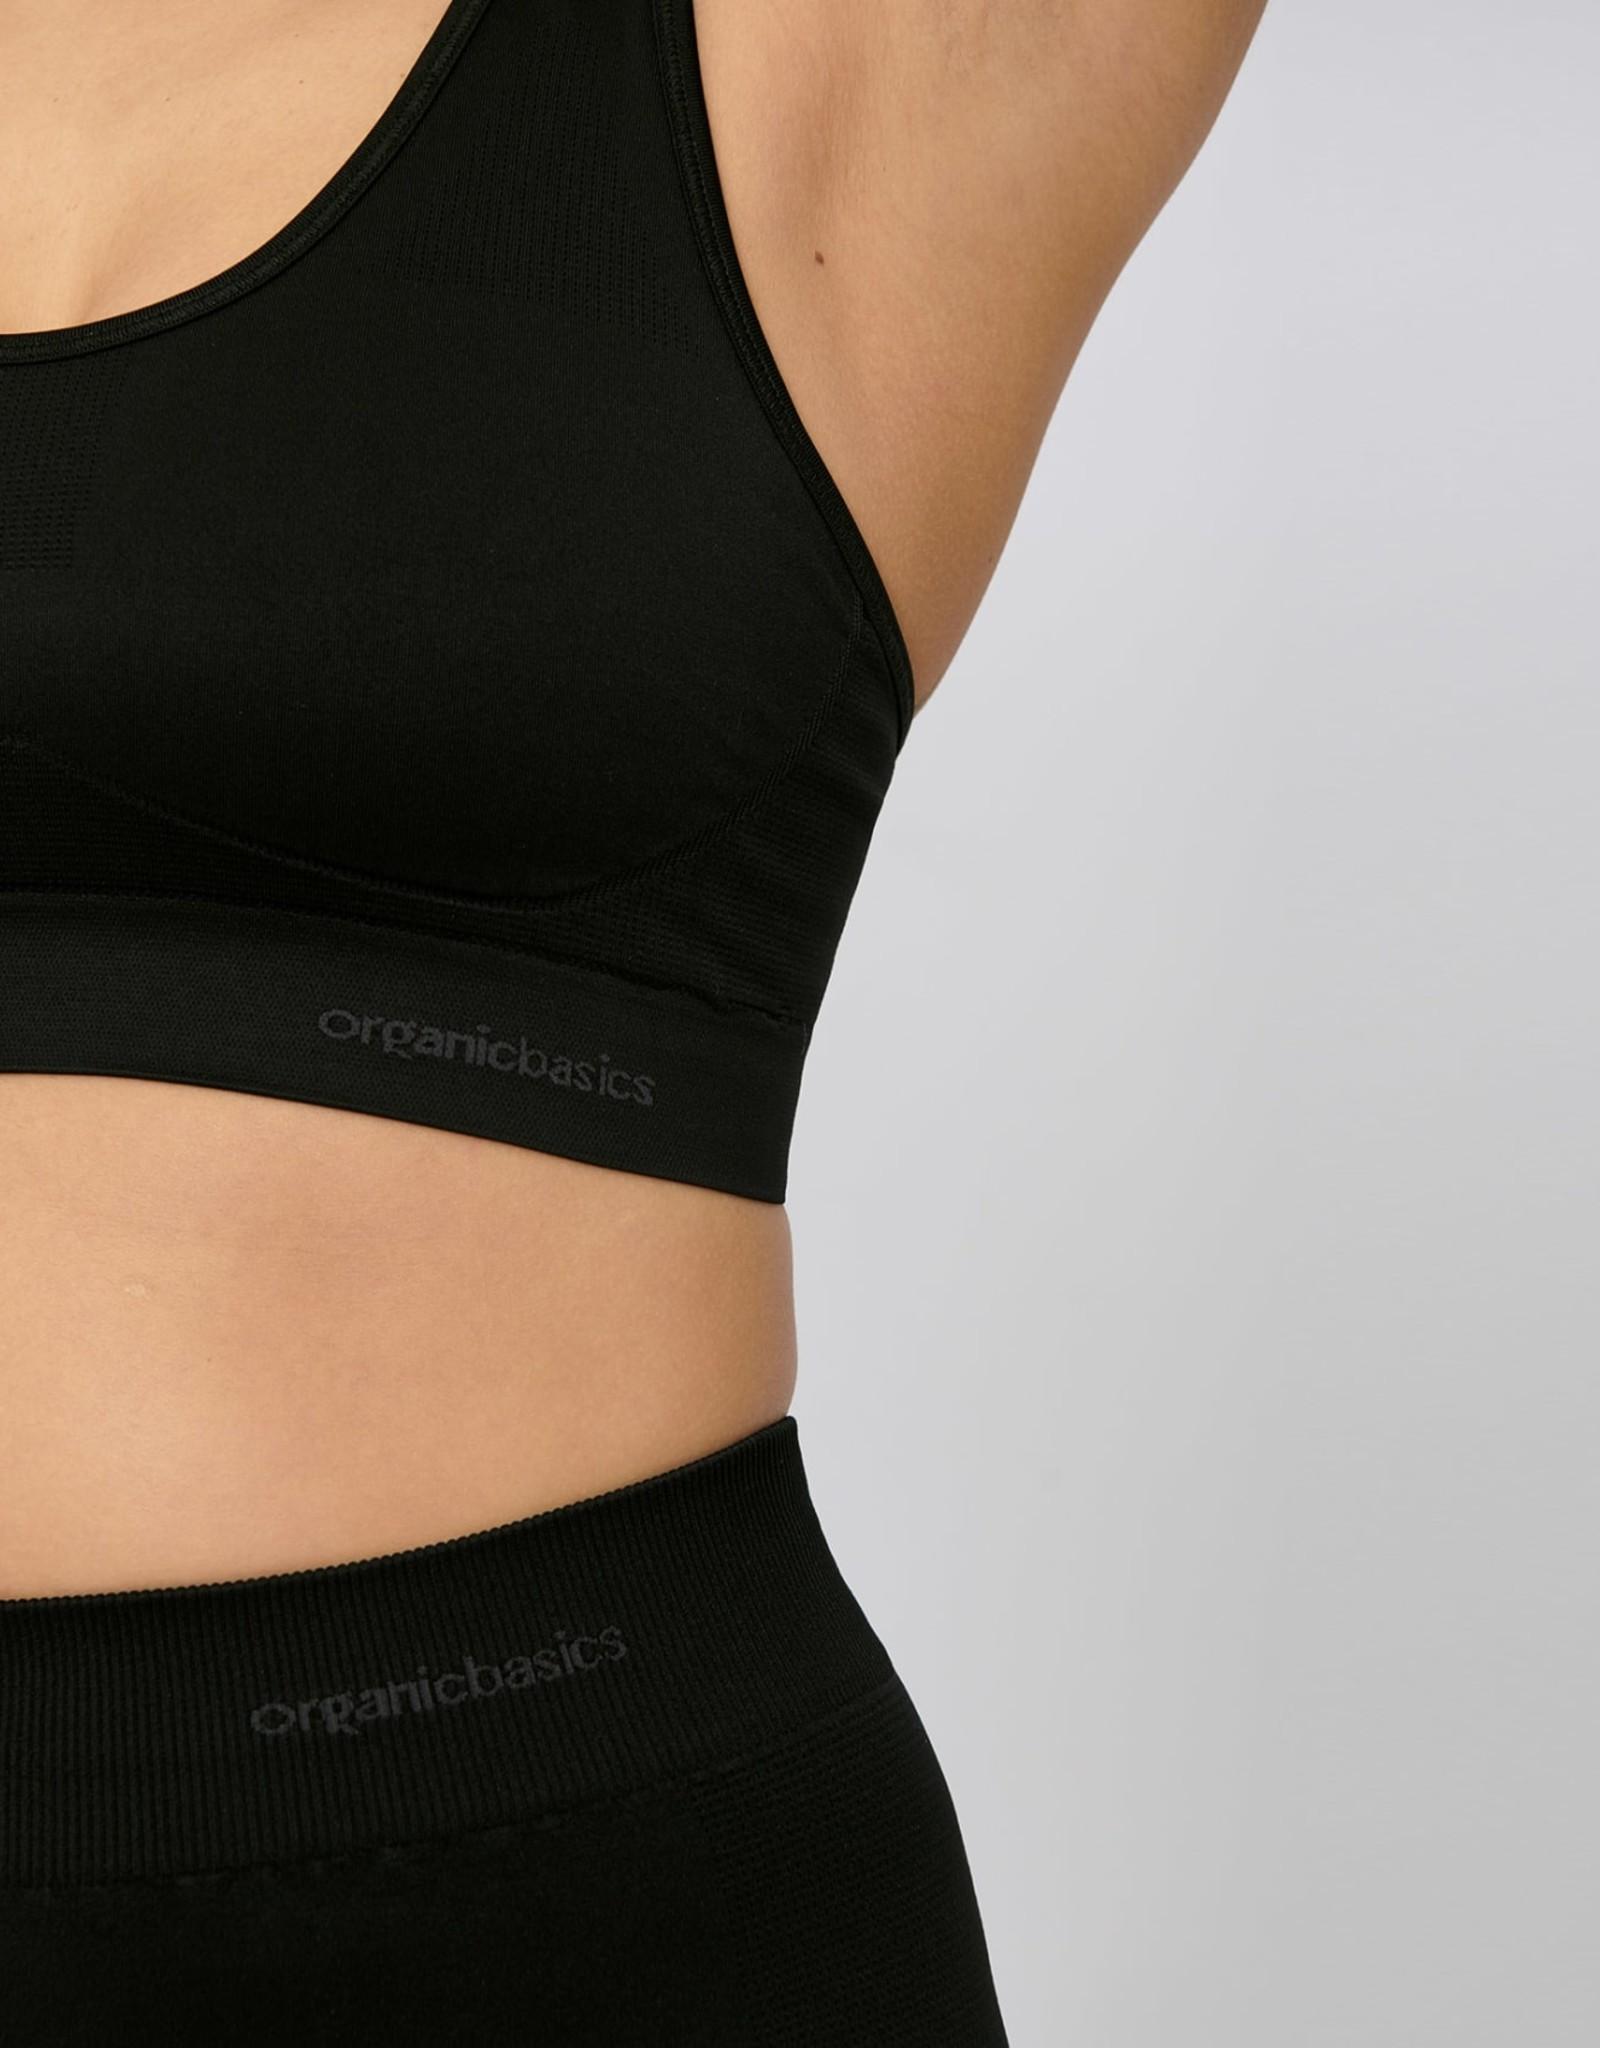 Organic Basics Active Workout Bra - zwart